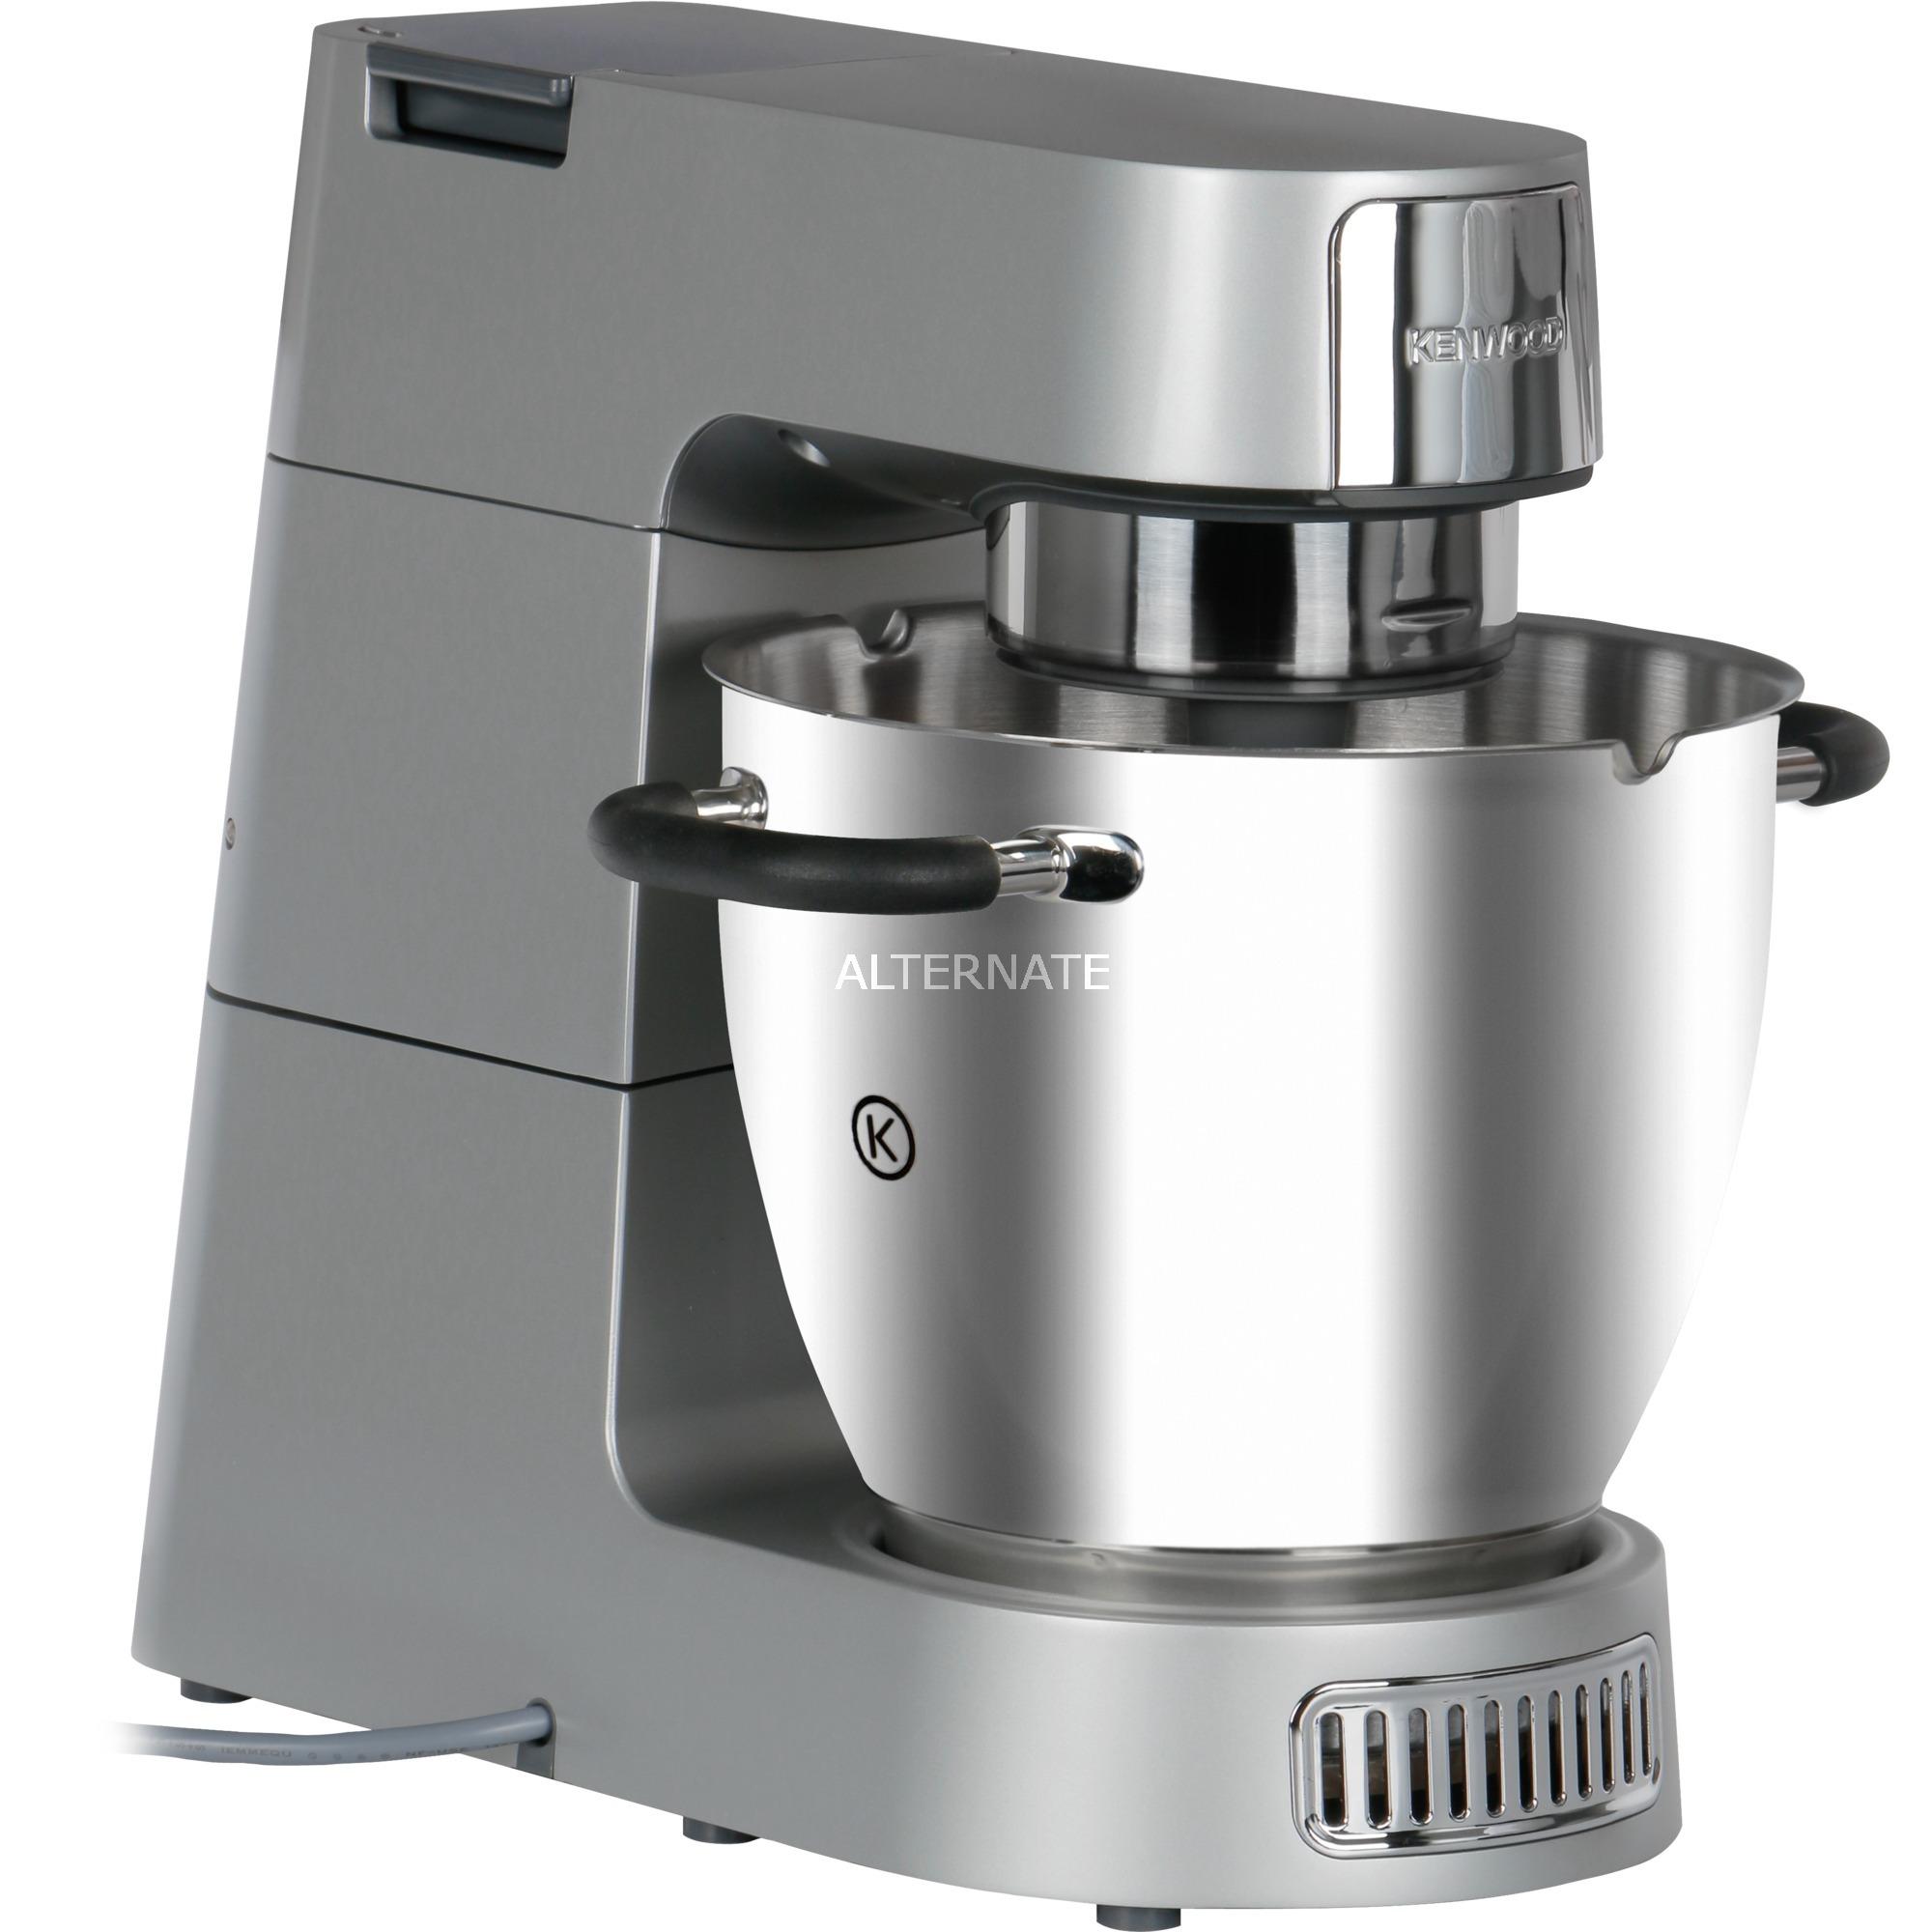 Kenwood Cooking Chef Gourmet KCC9060S 6,7 L Argento 1500 W, Robot da ...